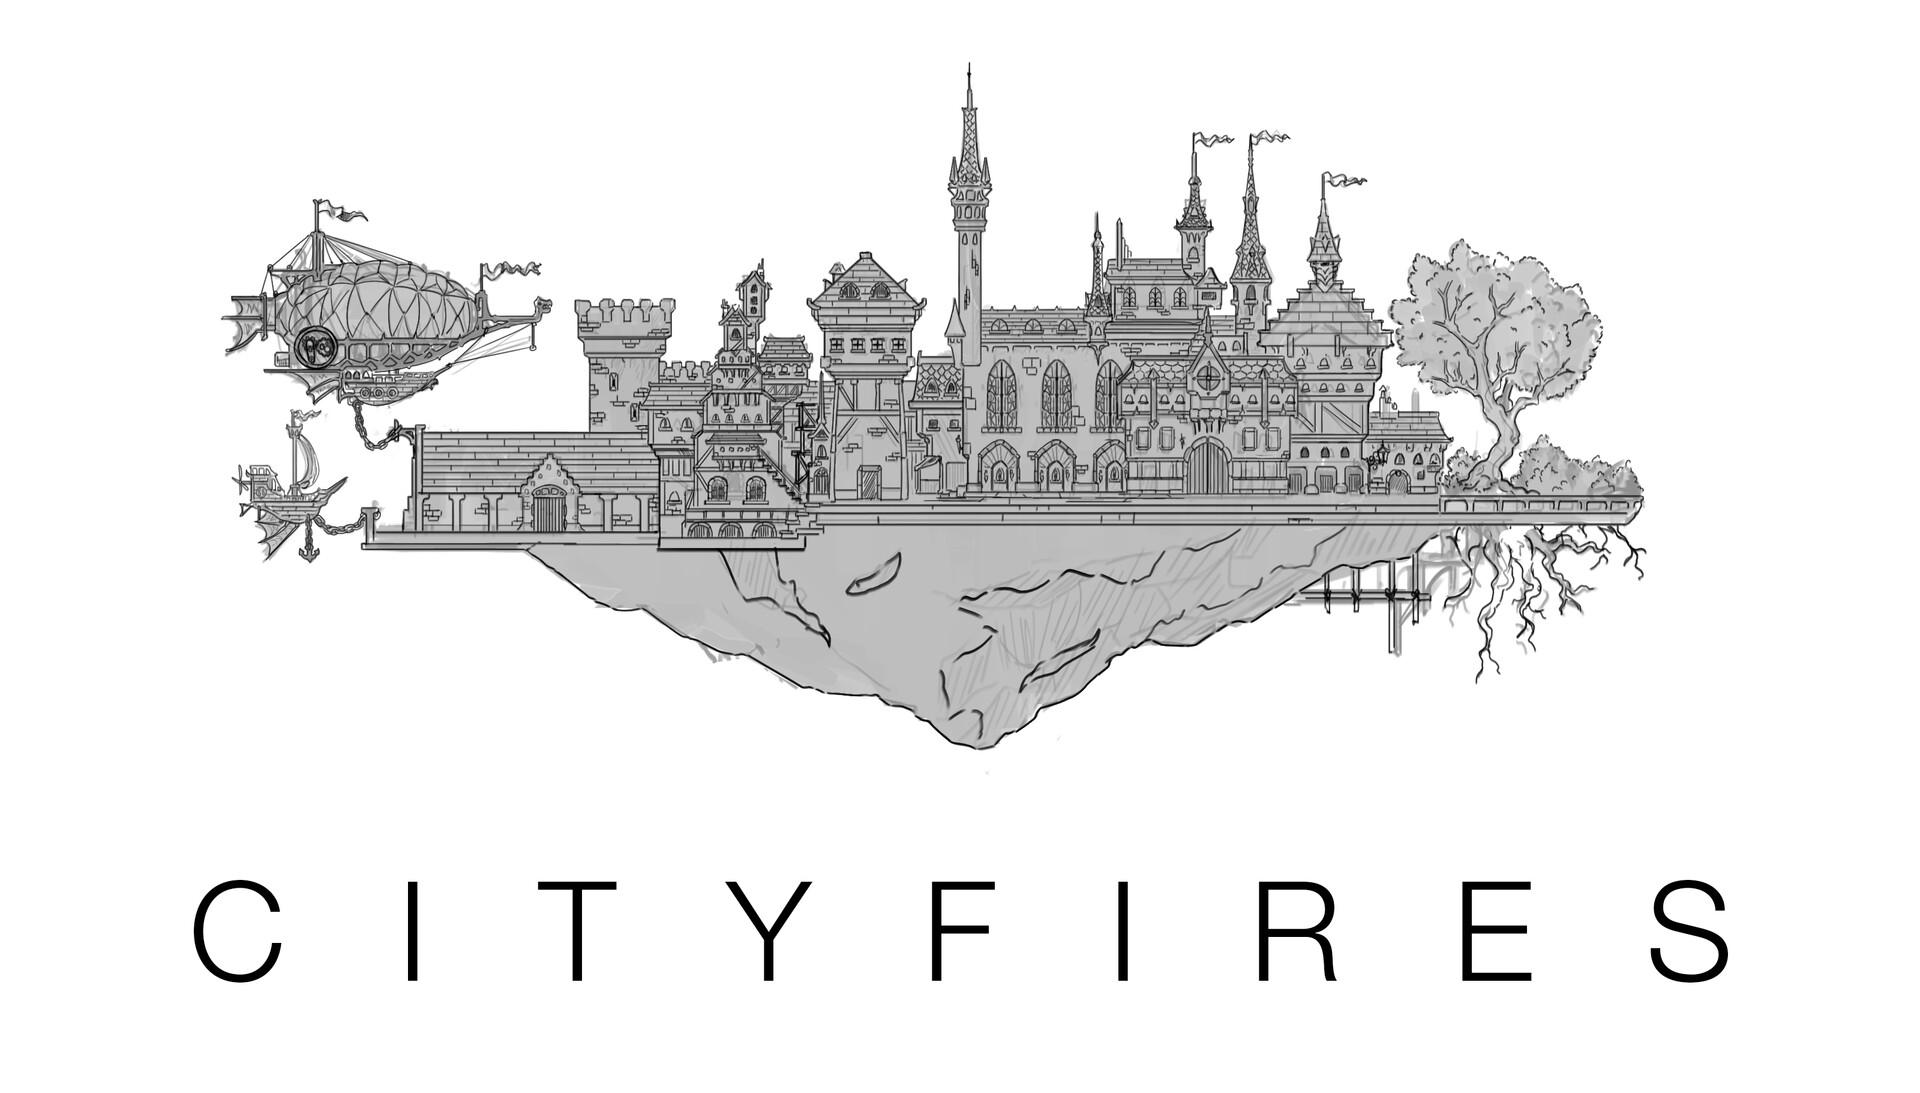 Arnesson art thomas hugo cityfires lineart 2linery art